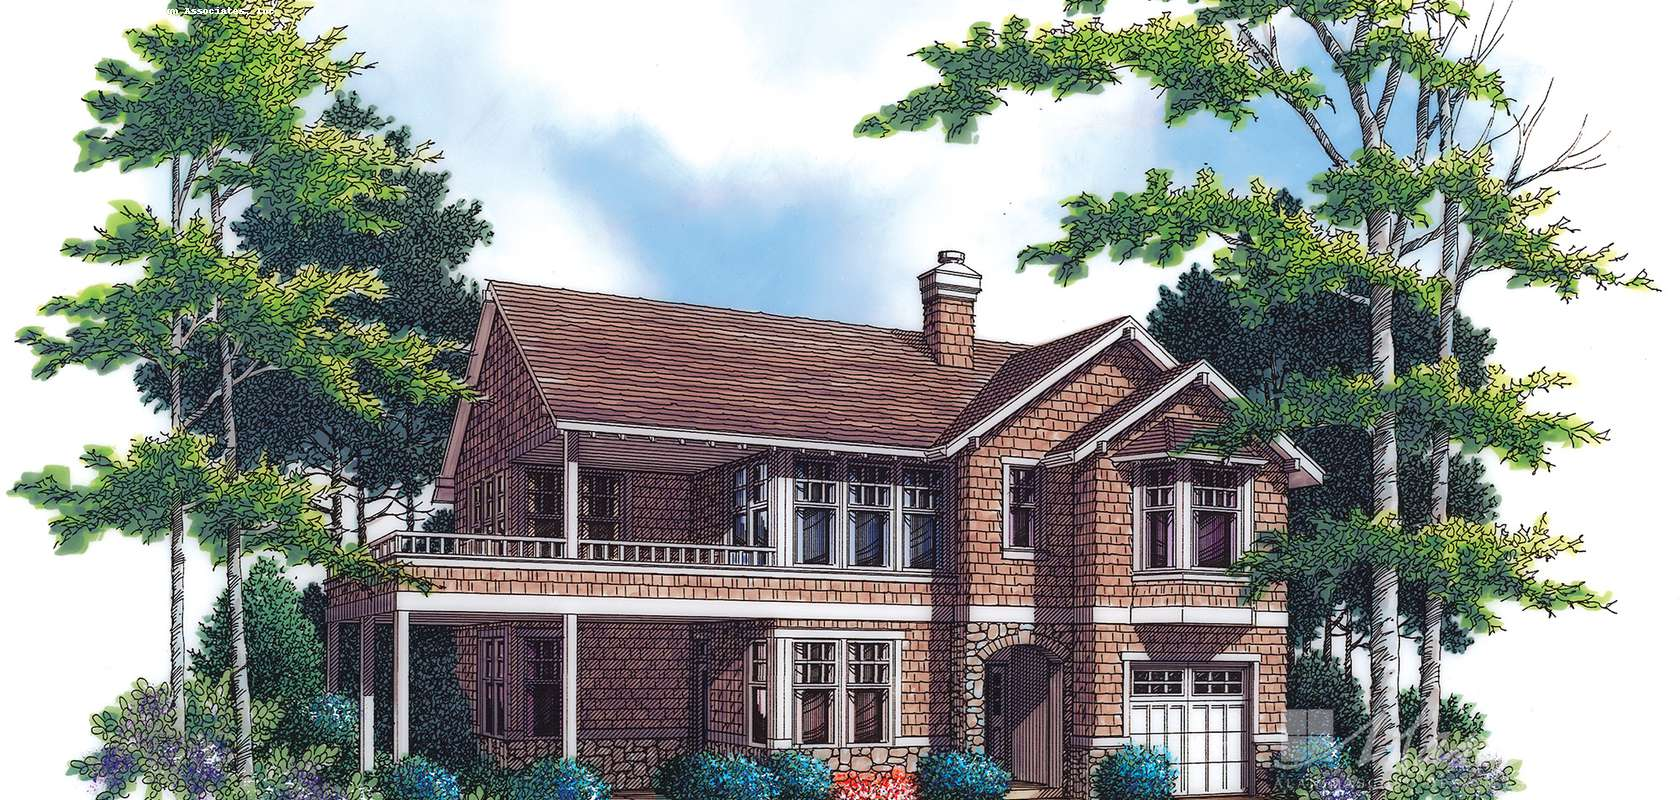 Mascord House Plan 2193: The Sullivann